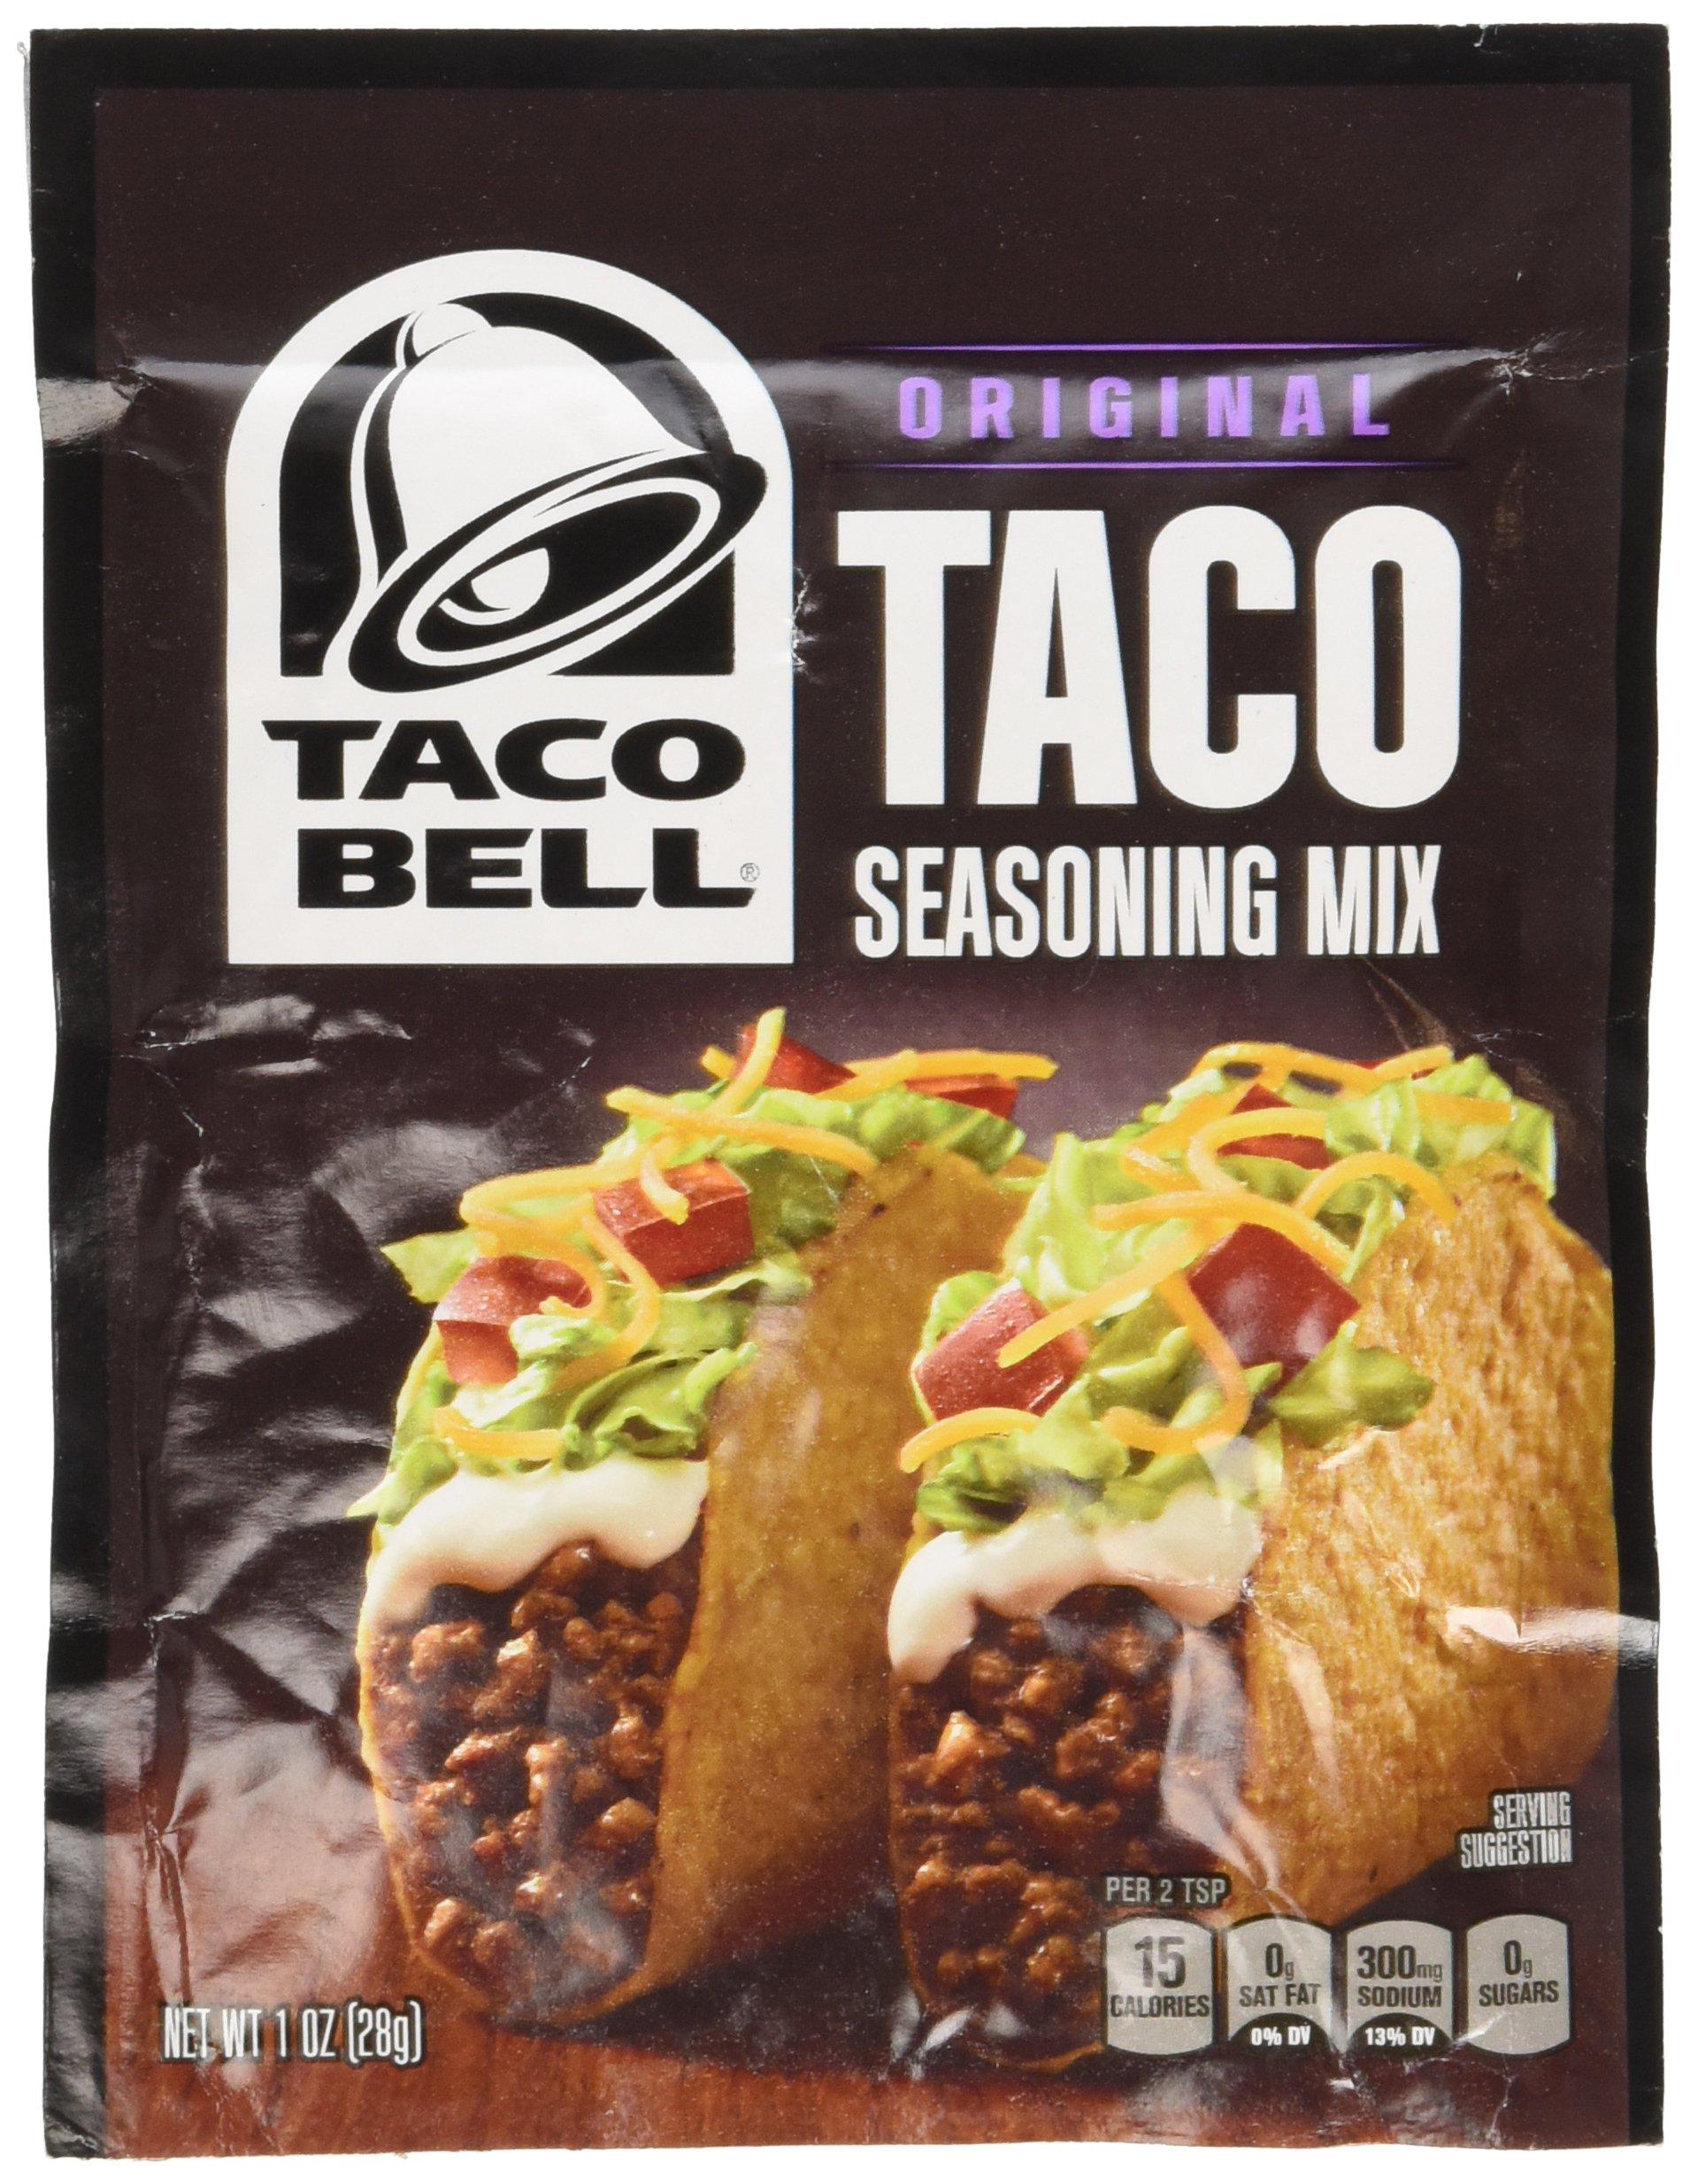 Taco Bell Taco Seasoning Mix 1oz (6 Packets)